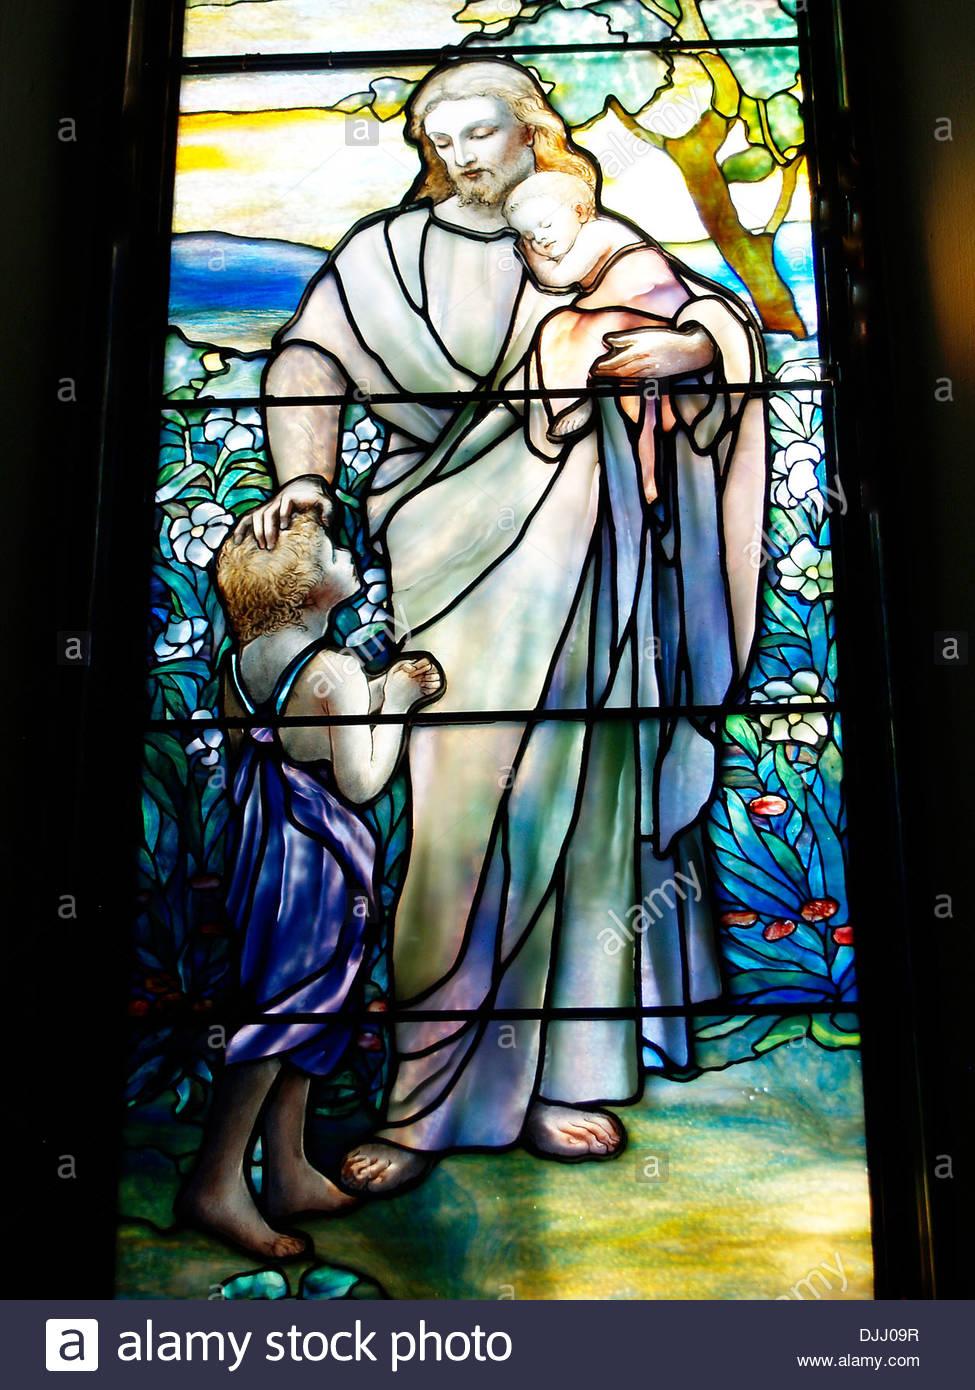 Tiffany stain glass window,St.John's Episcopal Church,Franklin,Pennsylvania - Stock Image